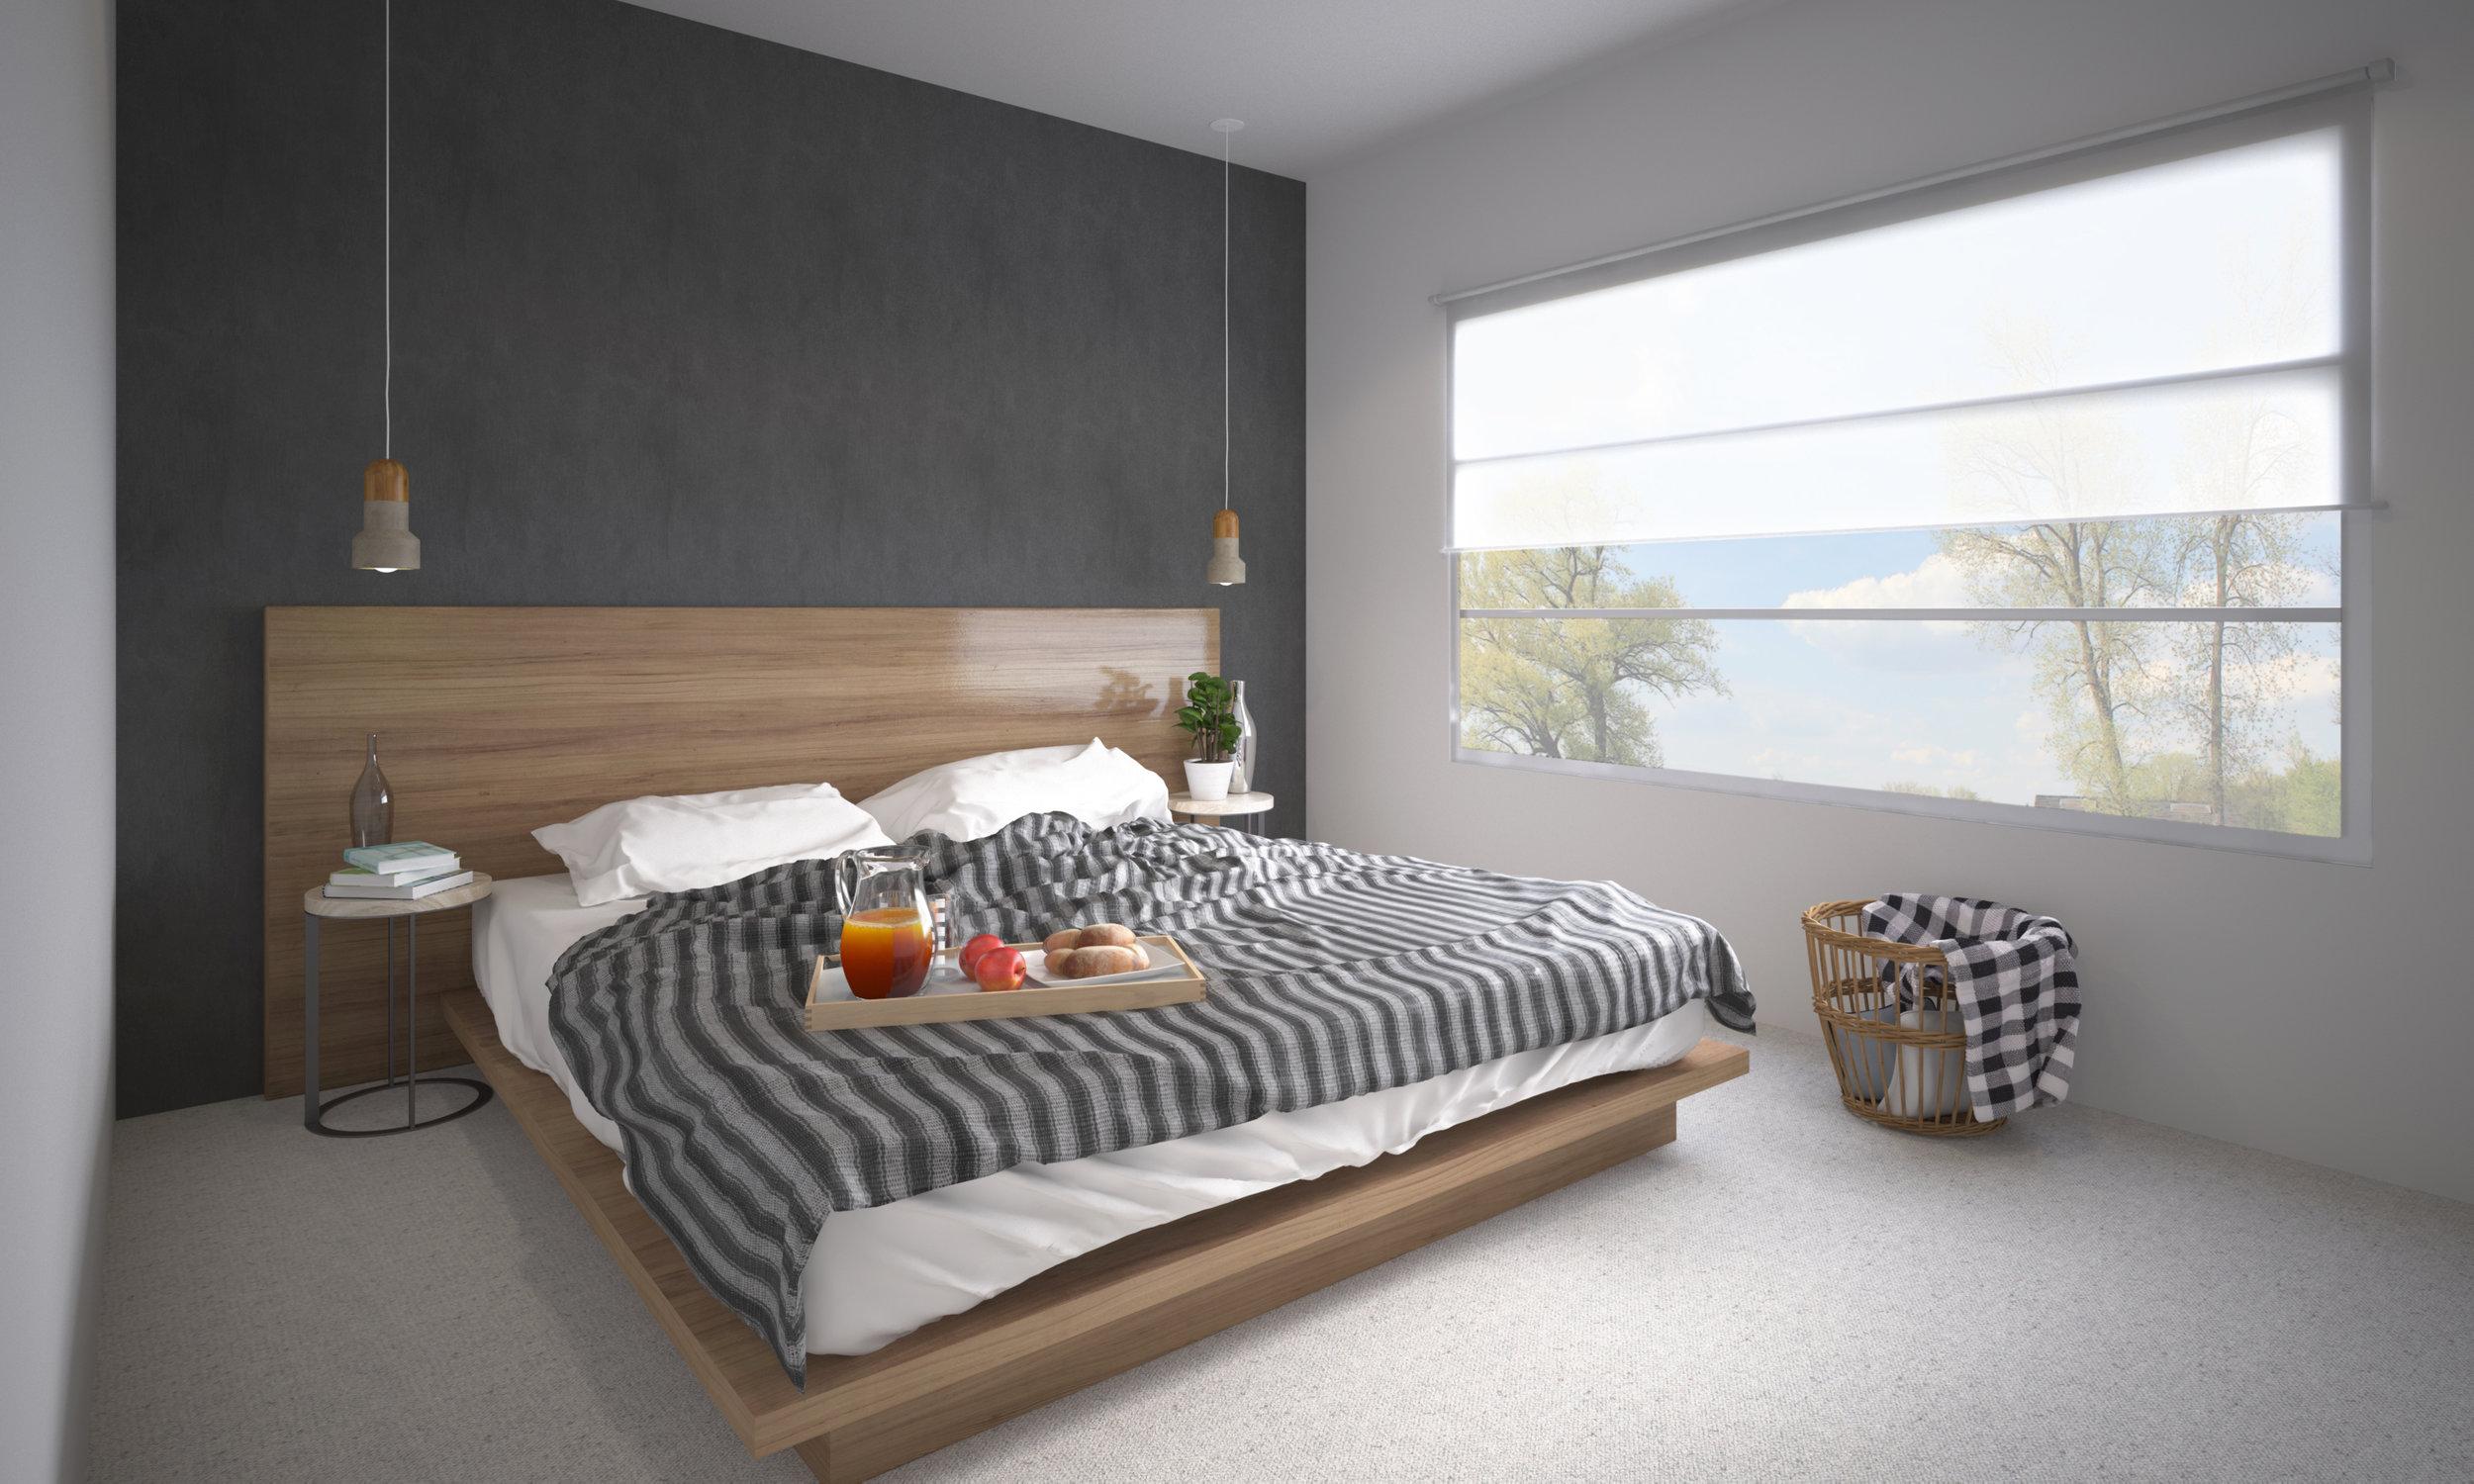 Copy of Bedroom with window.